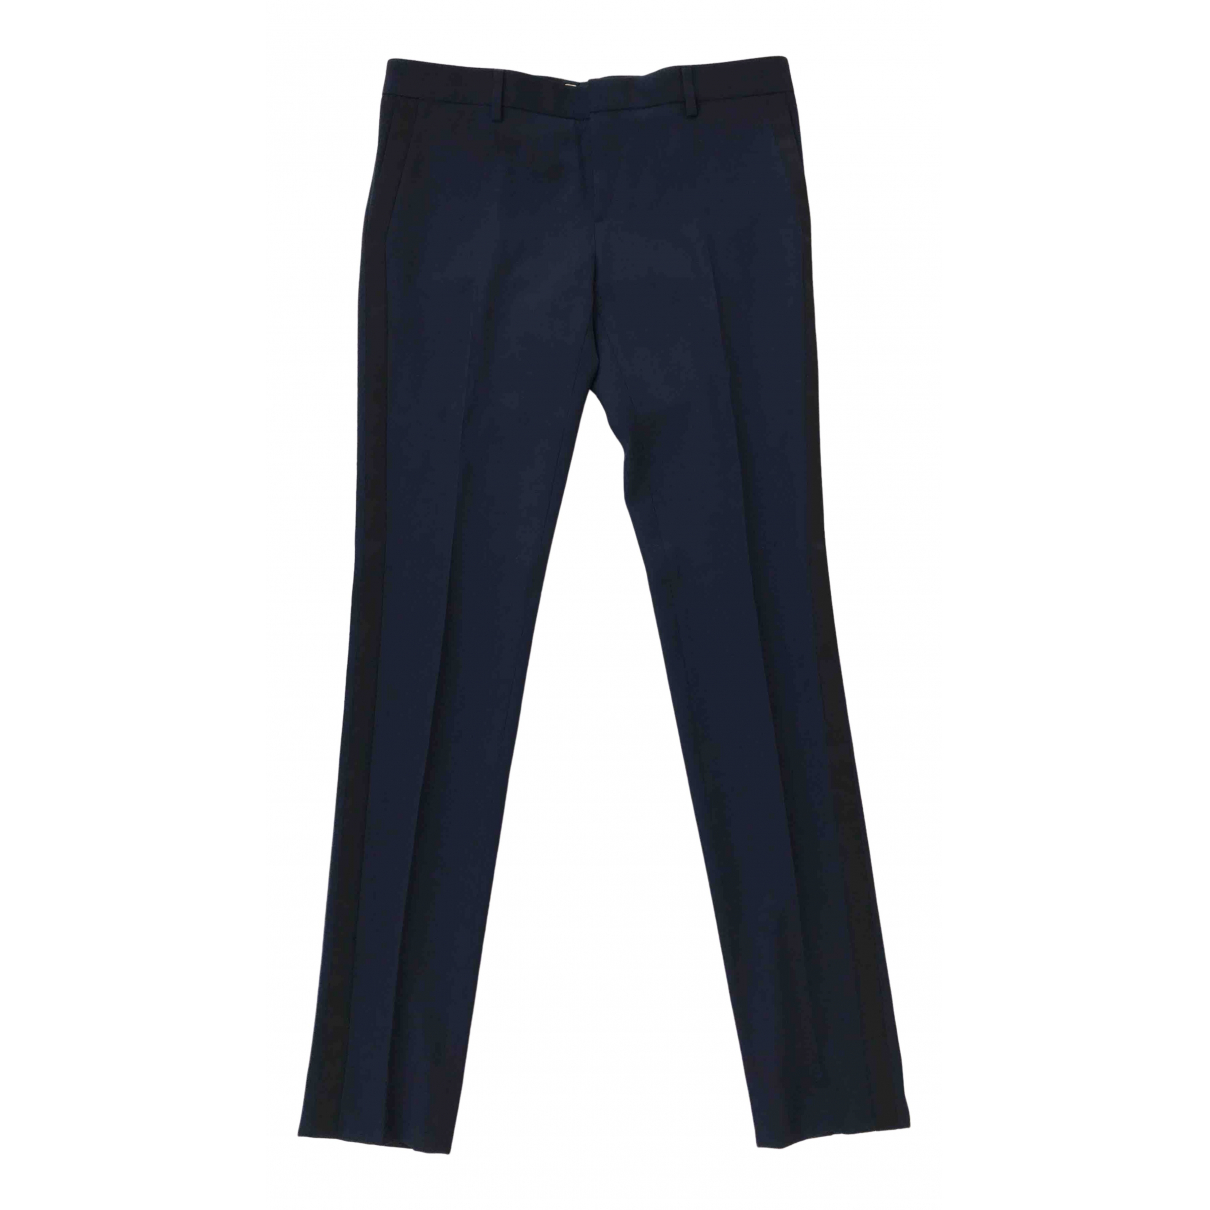 Saint Laurent N Black Wool Trousers for Women 40 FR